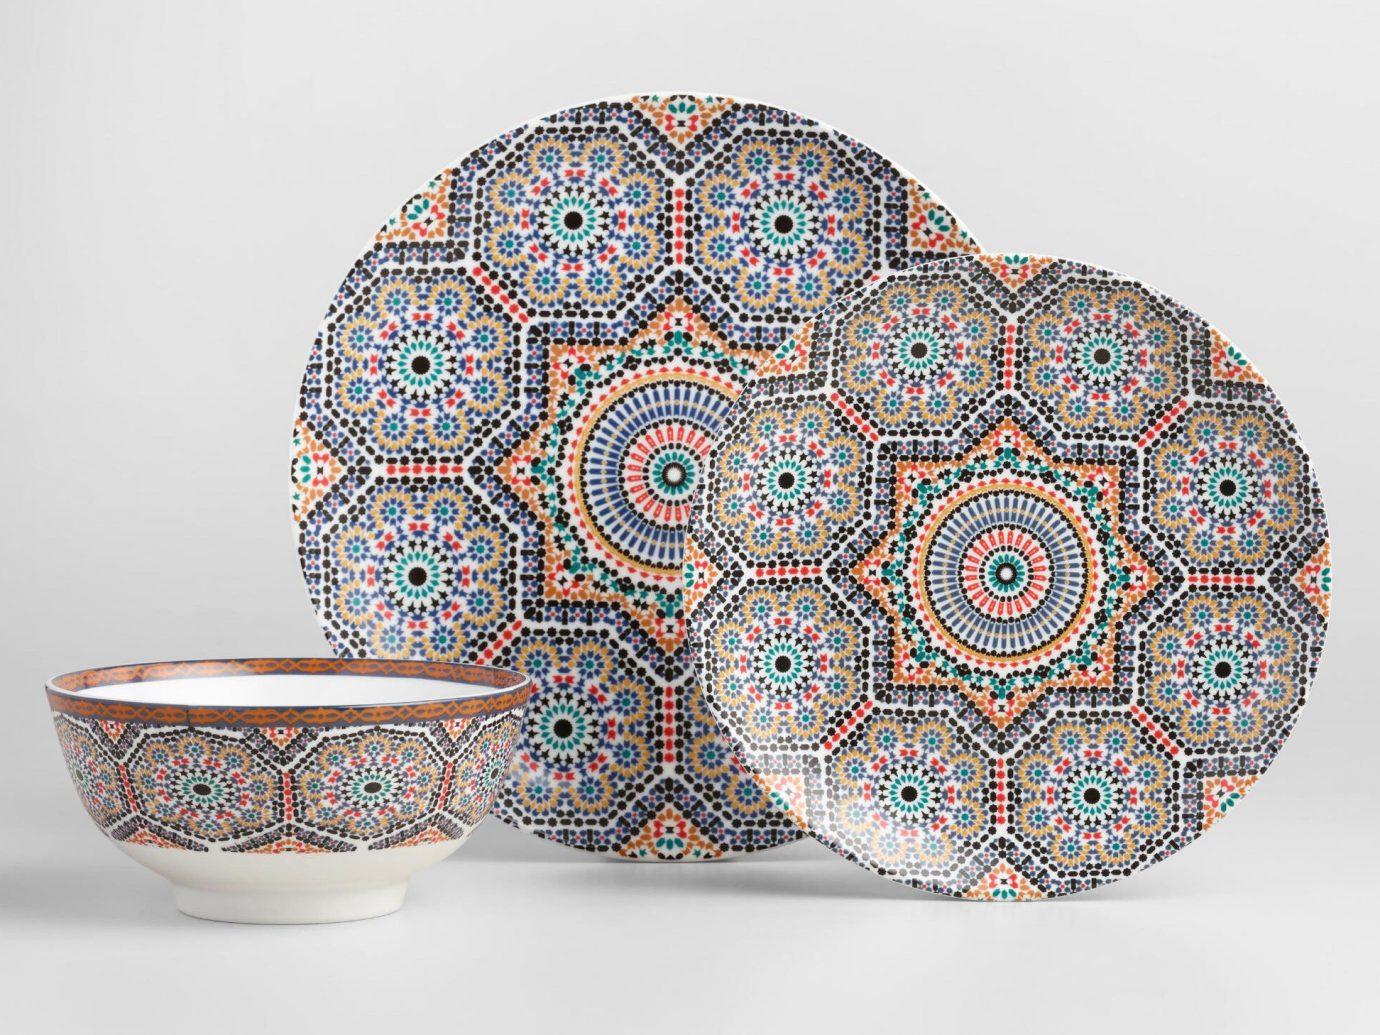 City Copenhagen Kyoto Marrakech Palm Springs Style + Design Travel Shop Tulum dishware tableware ceramic plate platter porcelain dinnerware set product design serveware